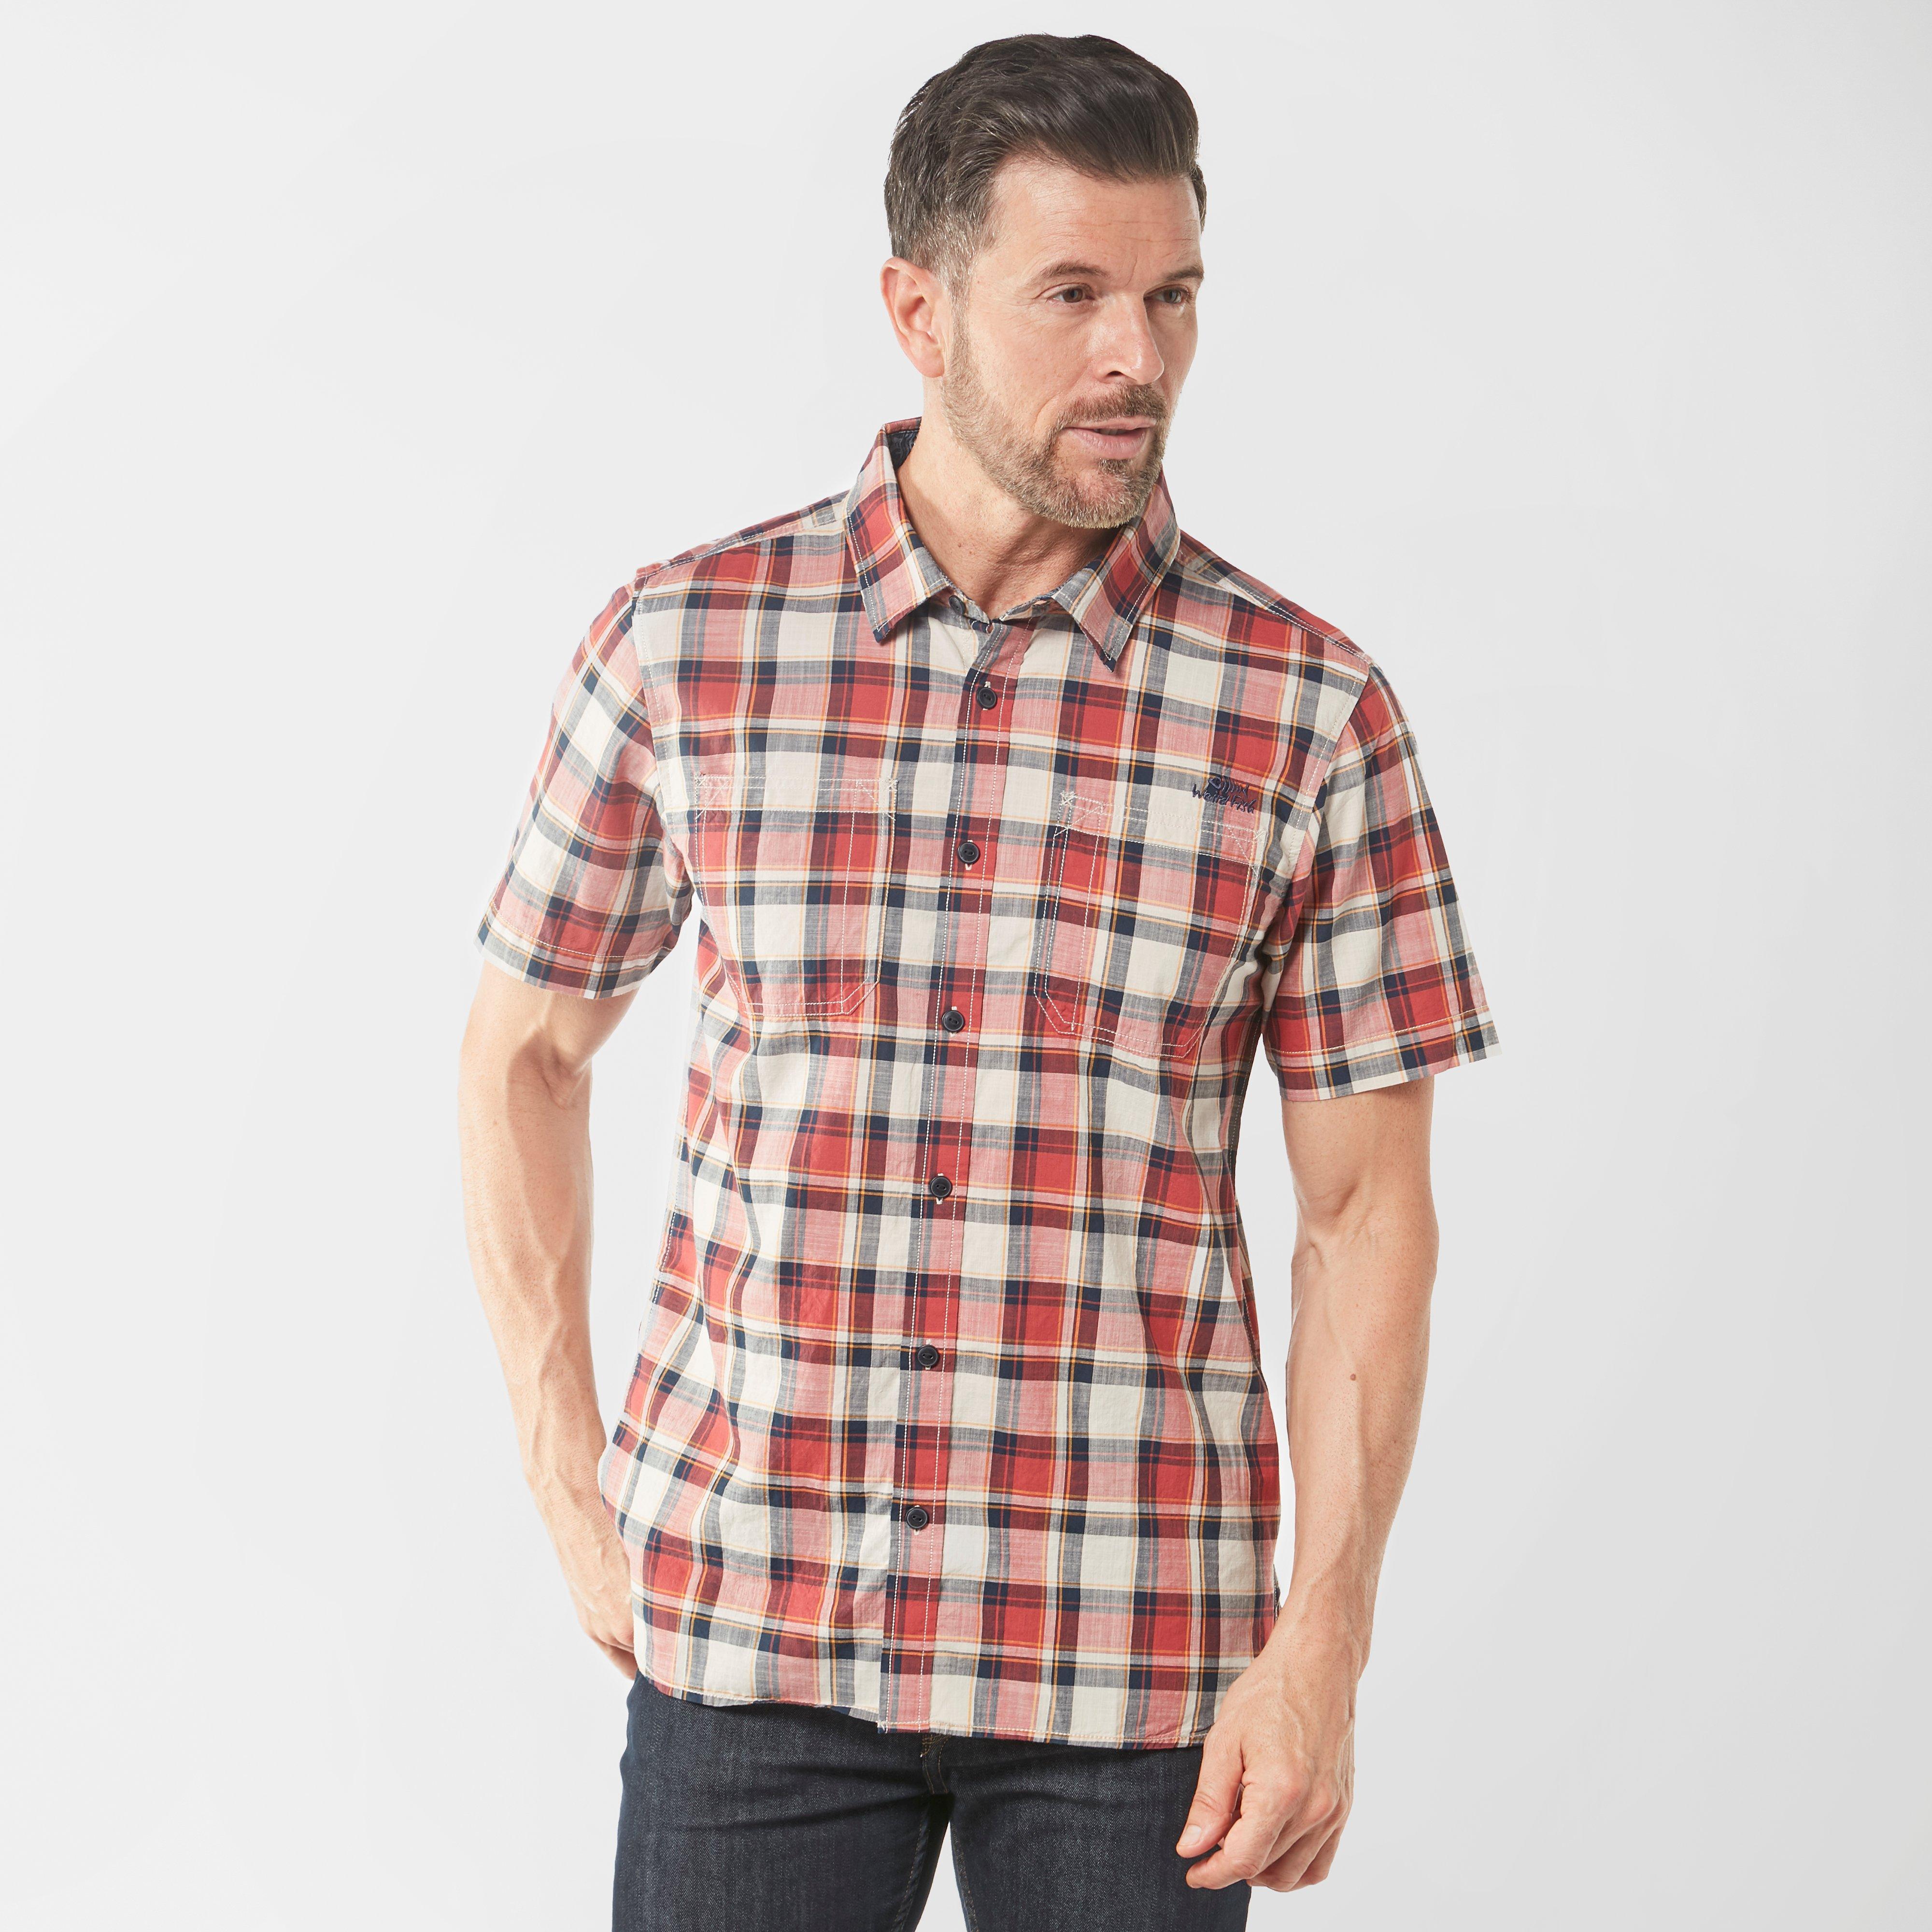 Weird Fish Mens Clane Slub Check Short Sleeve Shirt - Drd/drd  Drd/drd